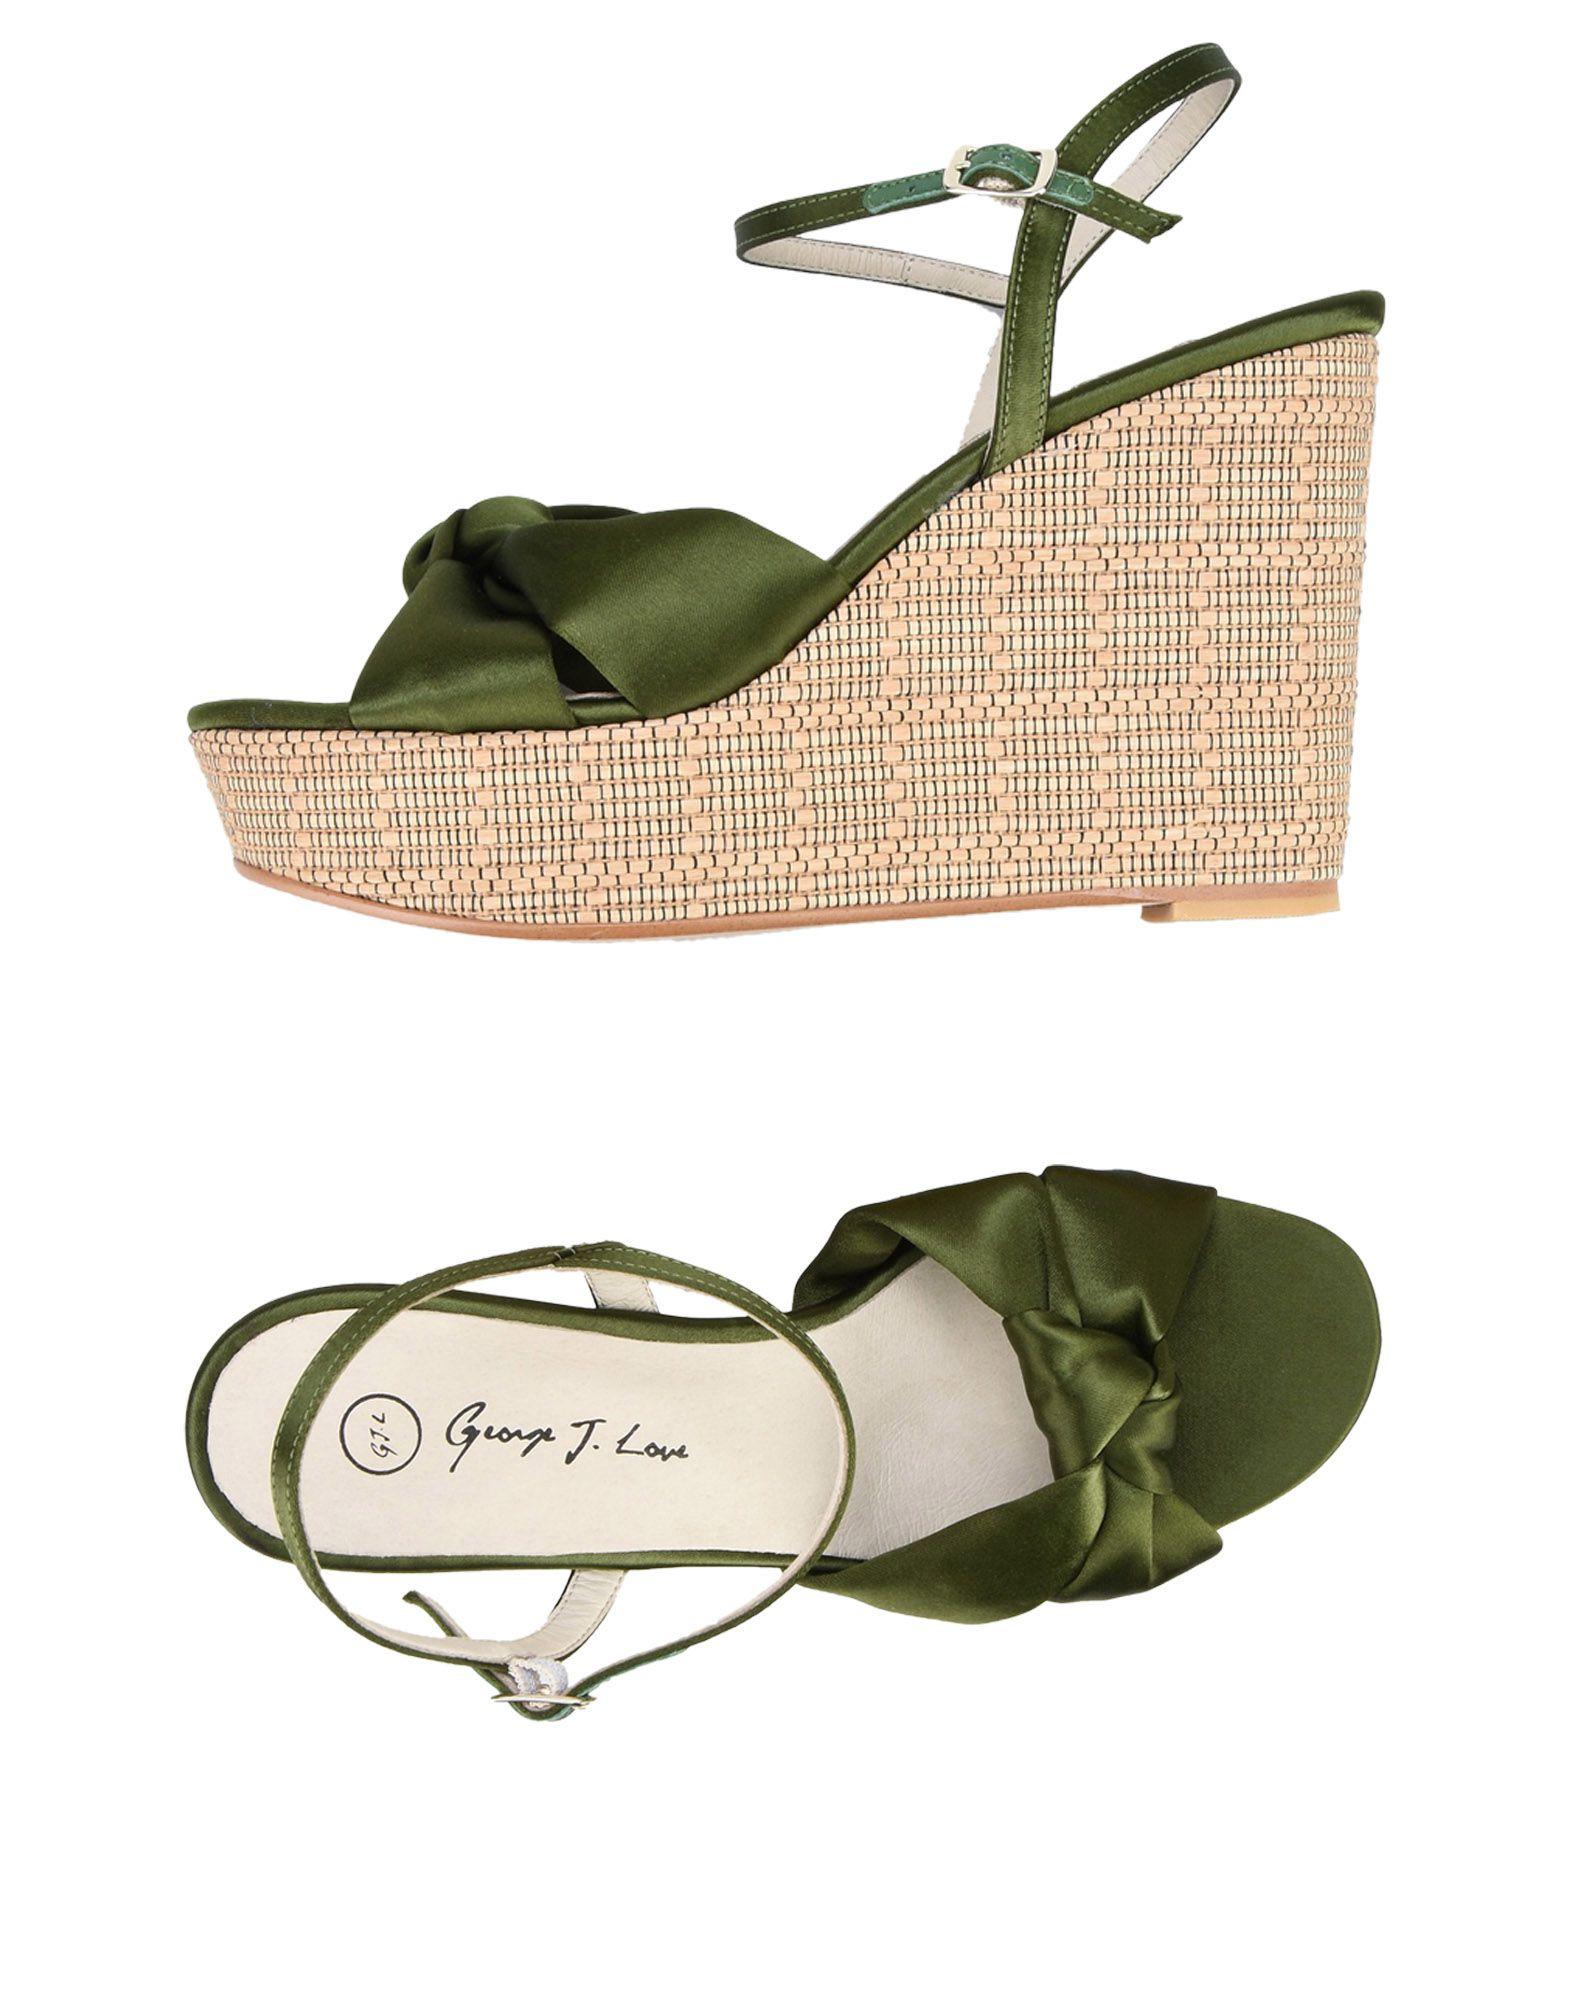 George J. Love Sandalen Damen  11456563OC Gute Qualität beliebte Schuhe